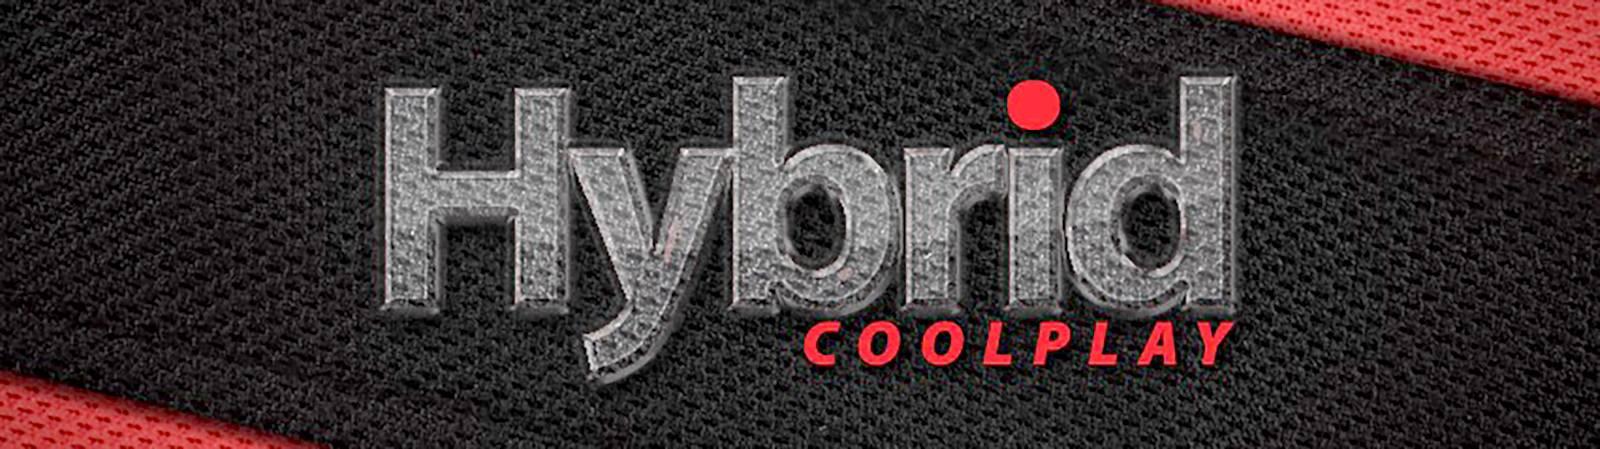 Target Coolplay Hybrid Dartshirts